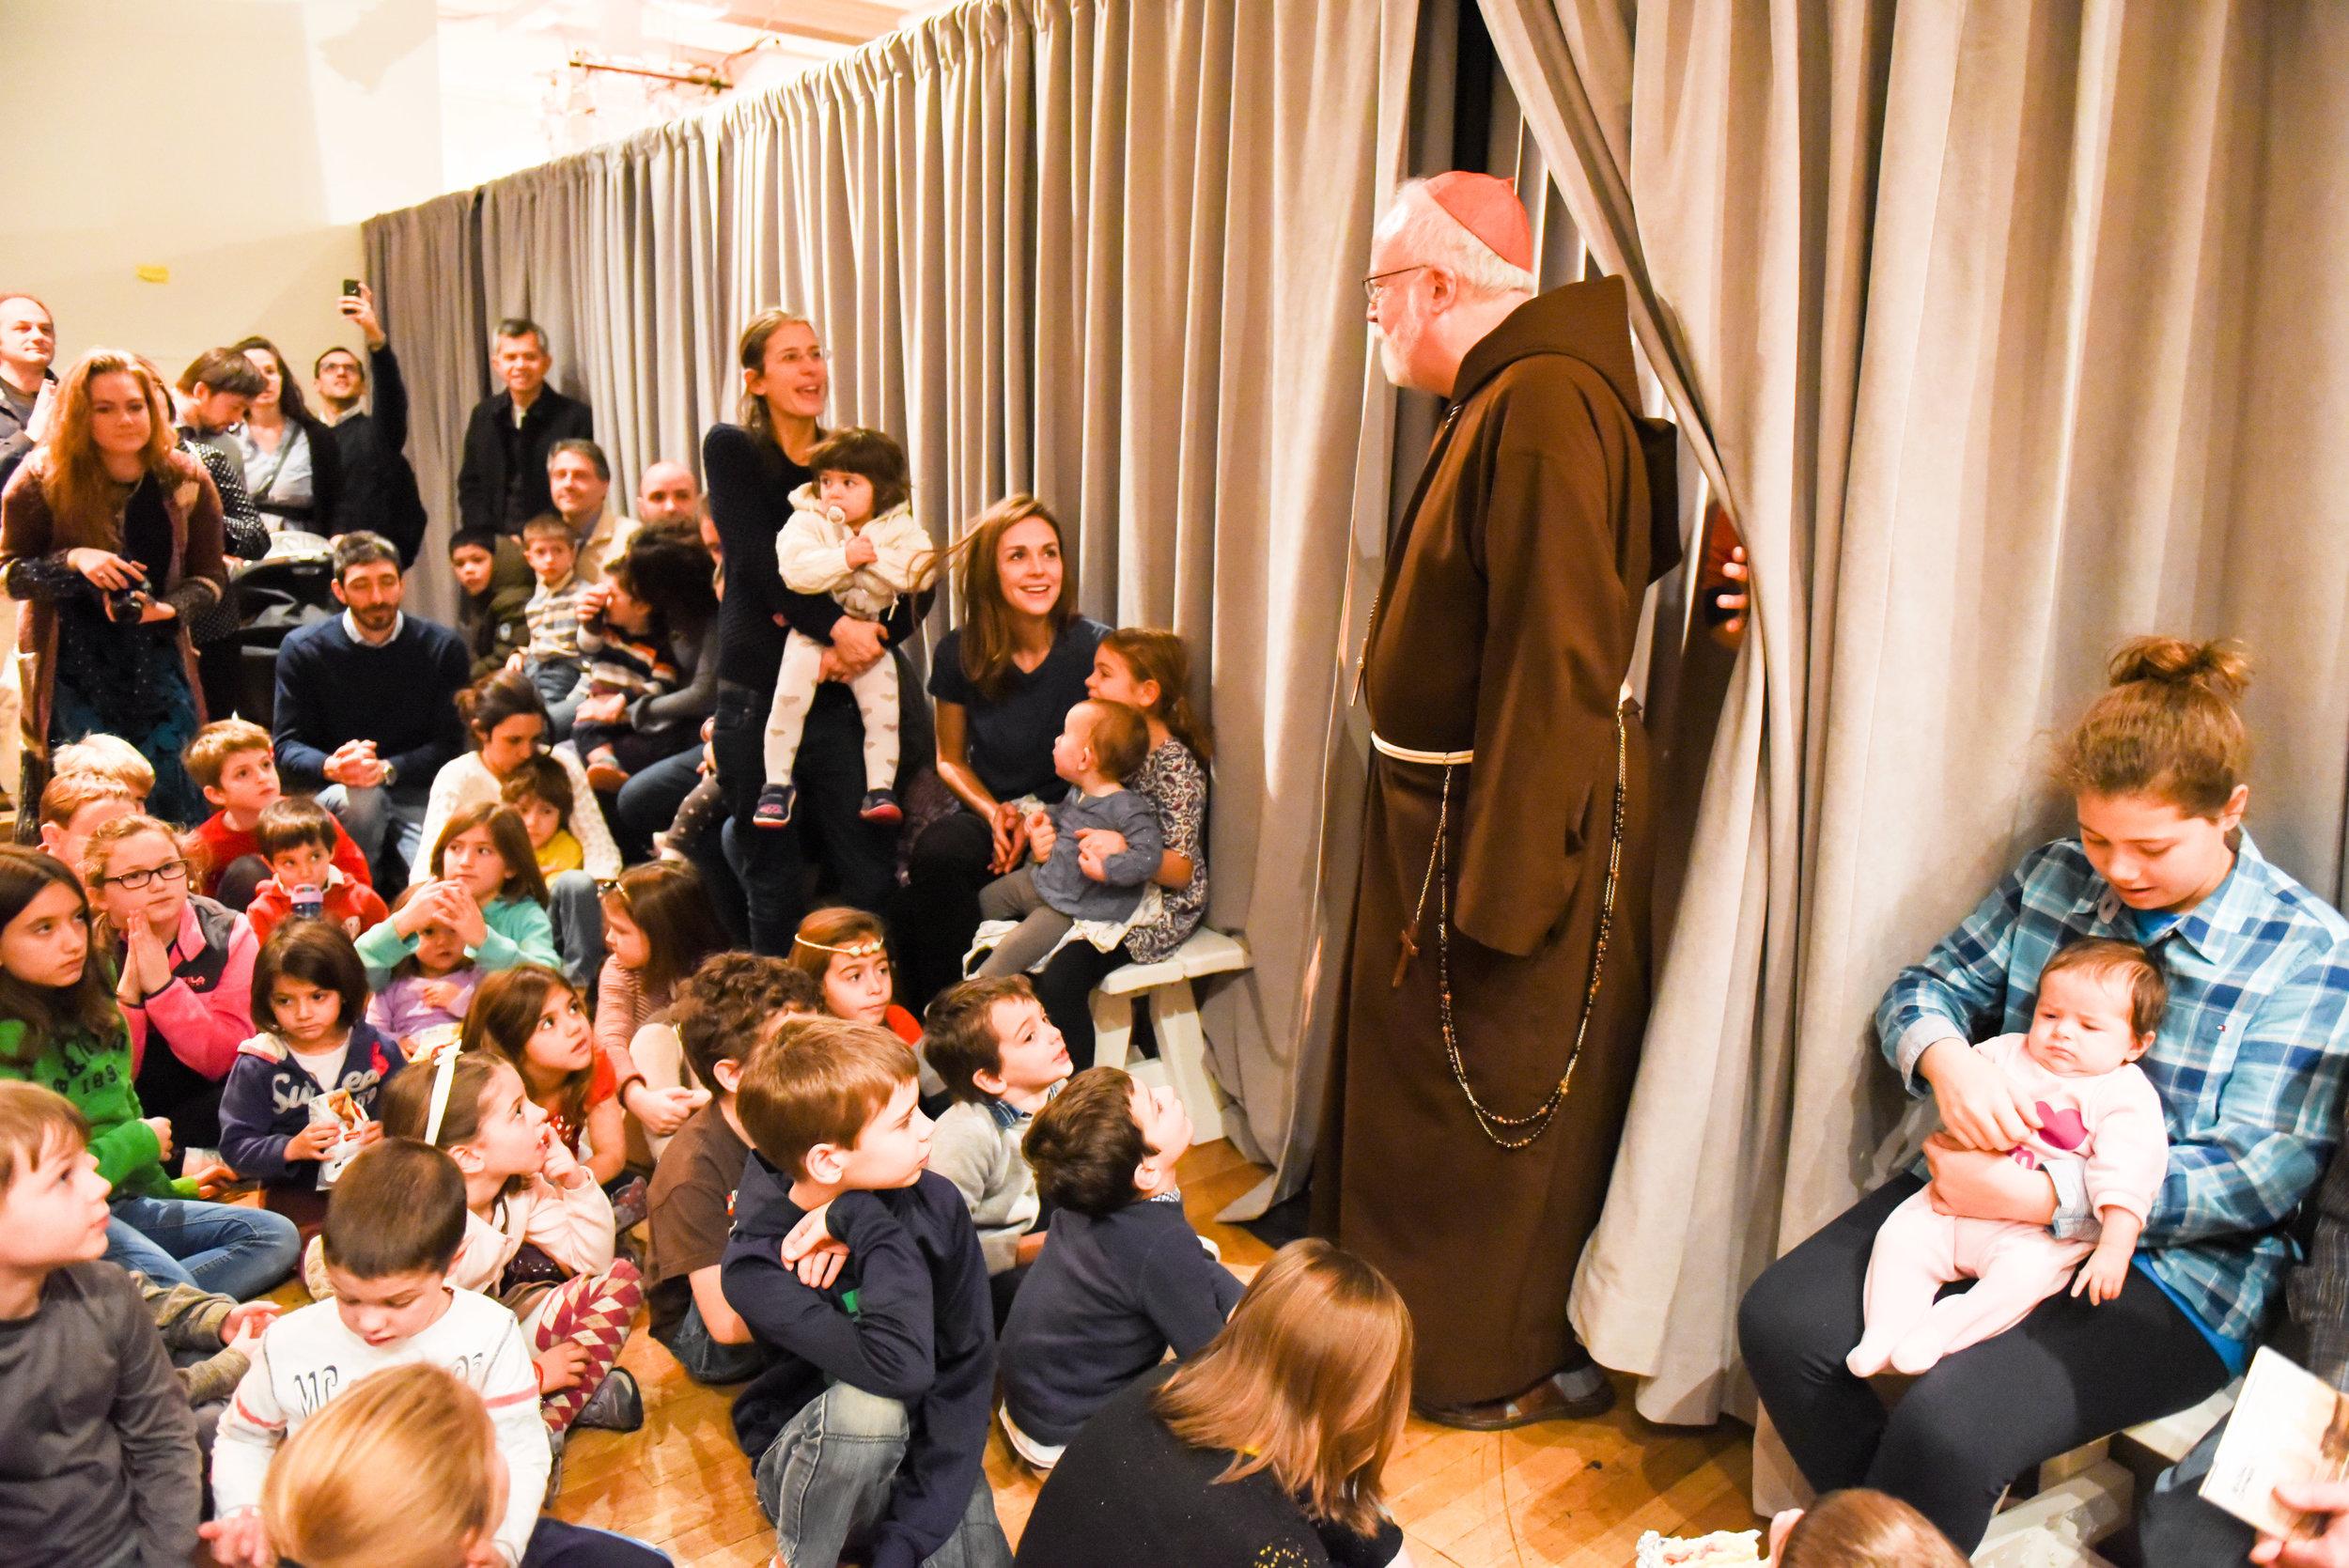 Cardinal o'Malley greets children at New York Encounter 2018